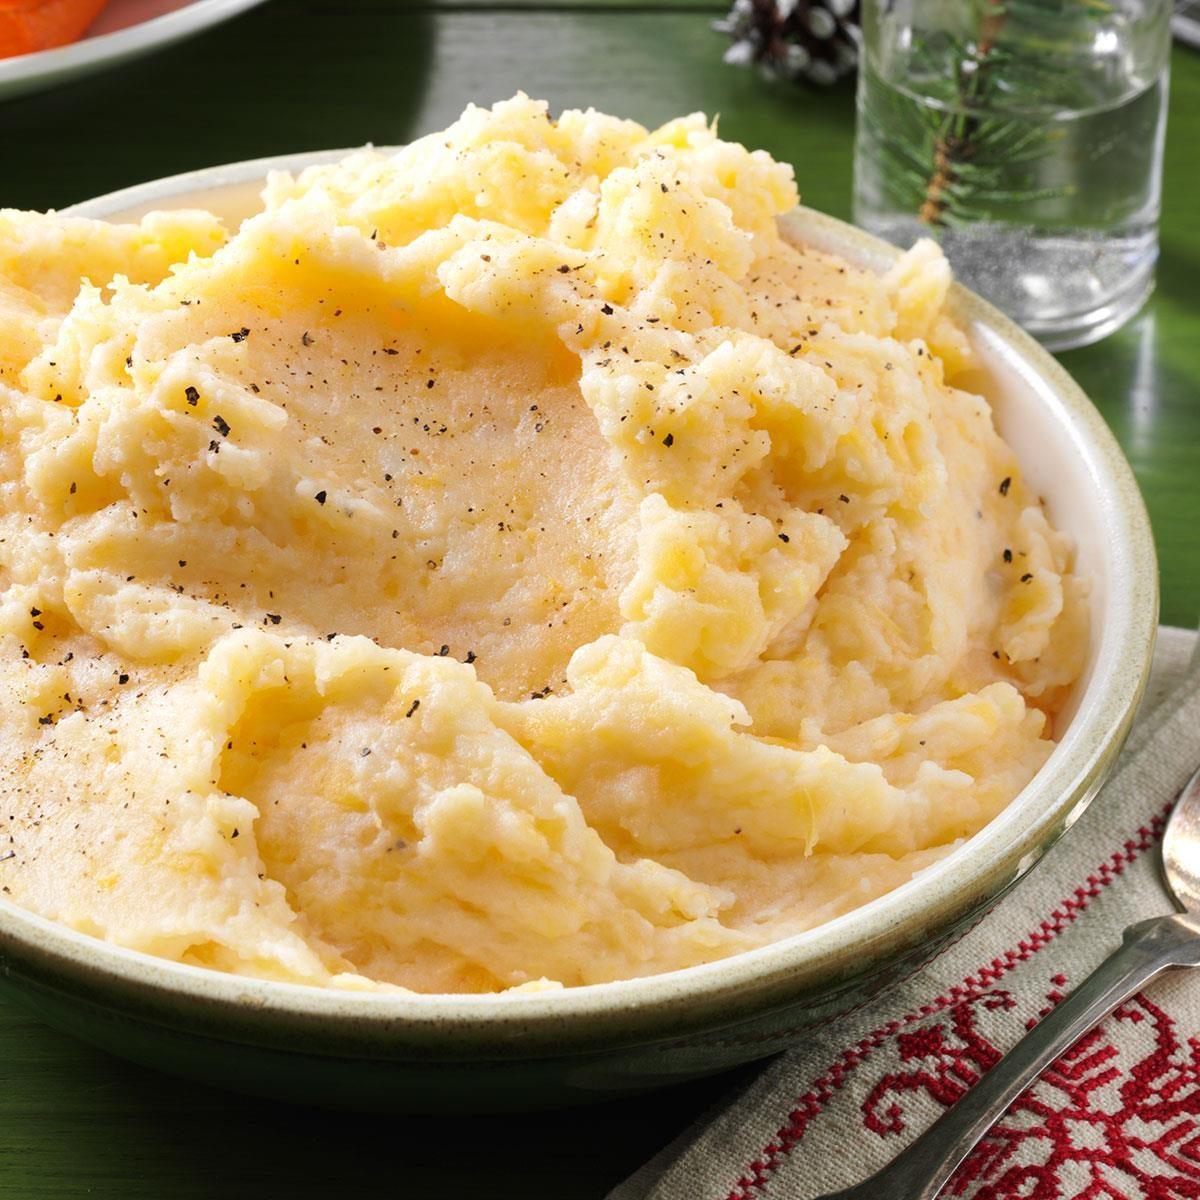 Louisiana: Garlic-Mashed Rutabagas & Potatoes